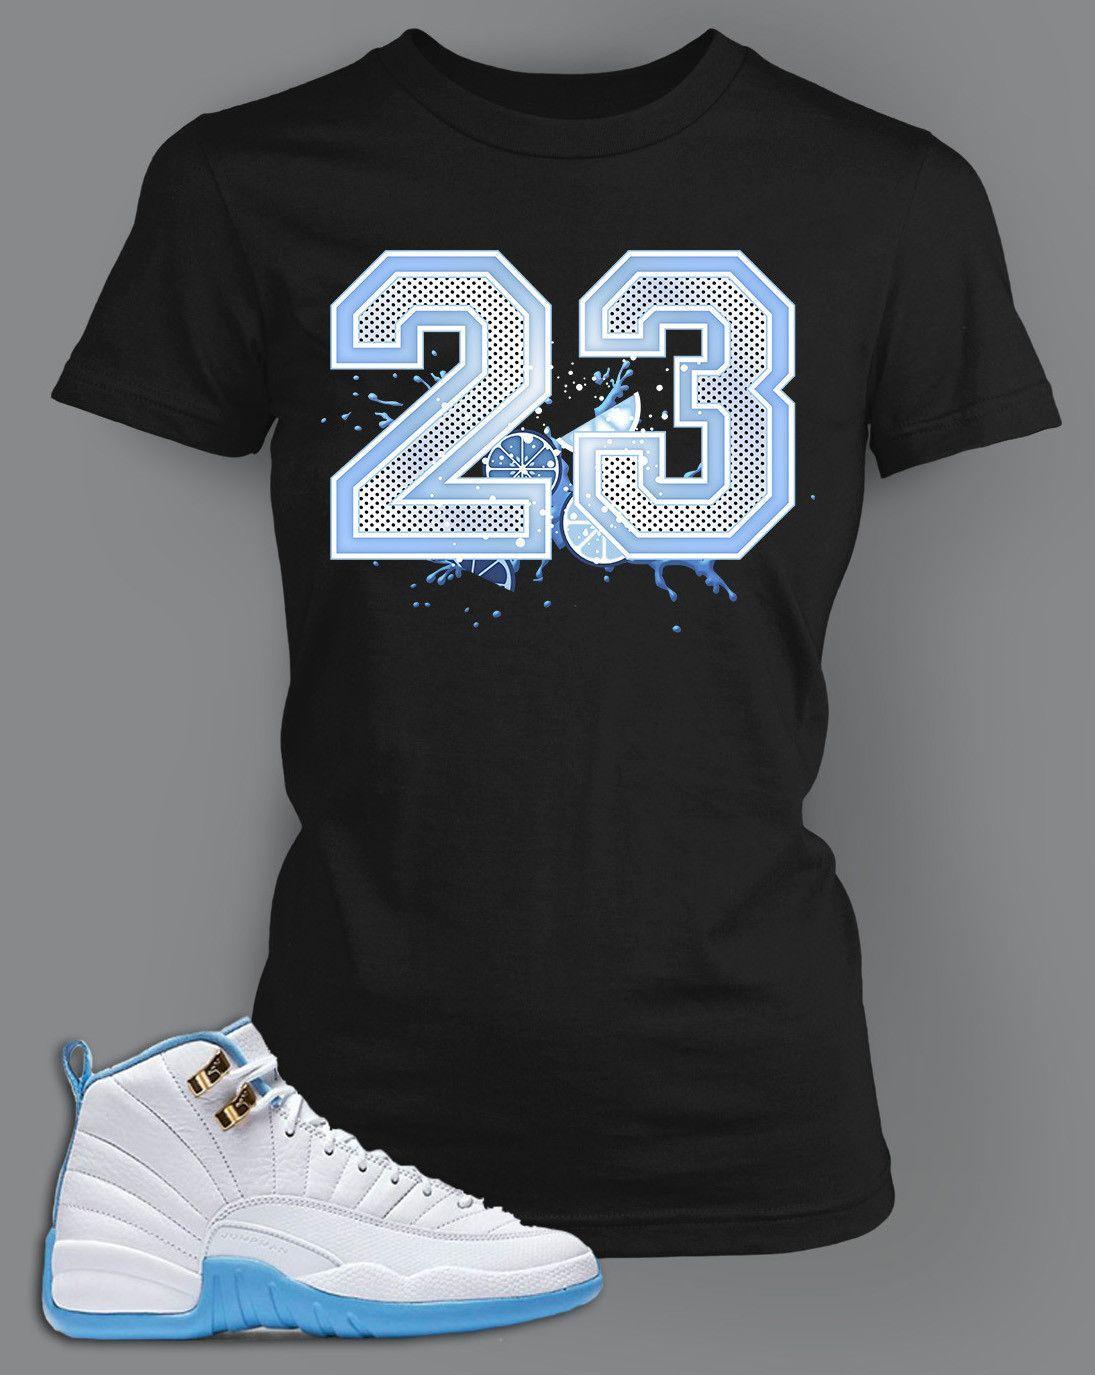 5c04a5dff58d0d Women s Graphic T Shirt To Match Retro Air Jordan 12 Melo Shoe in ...